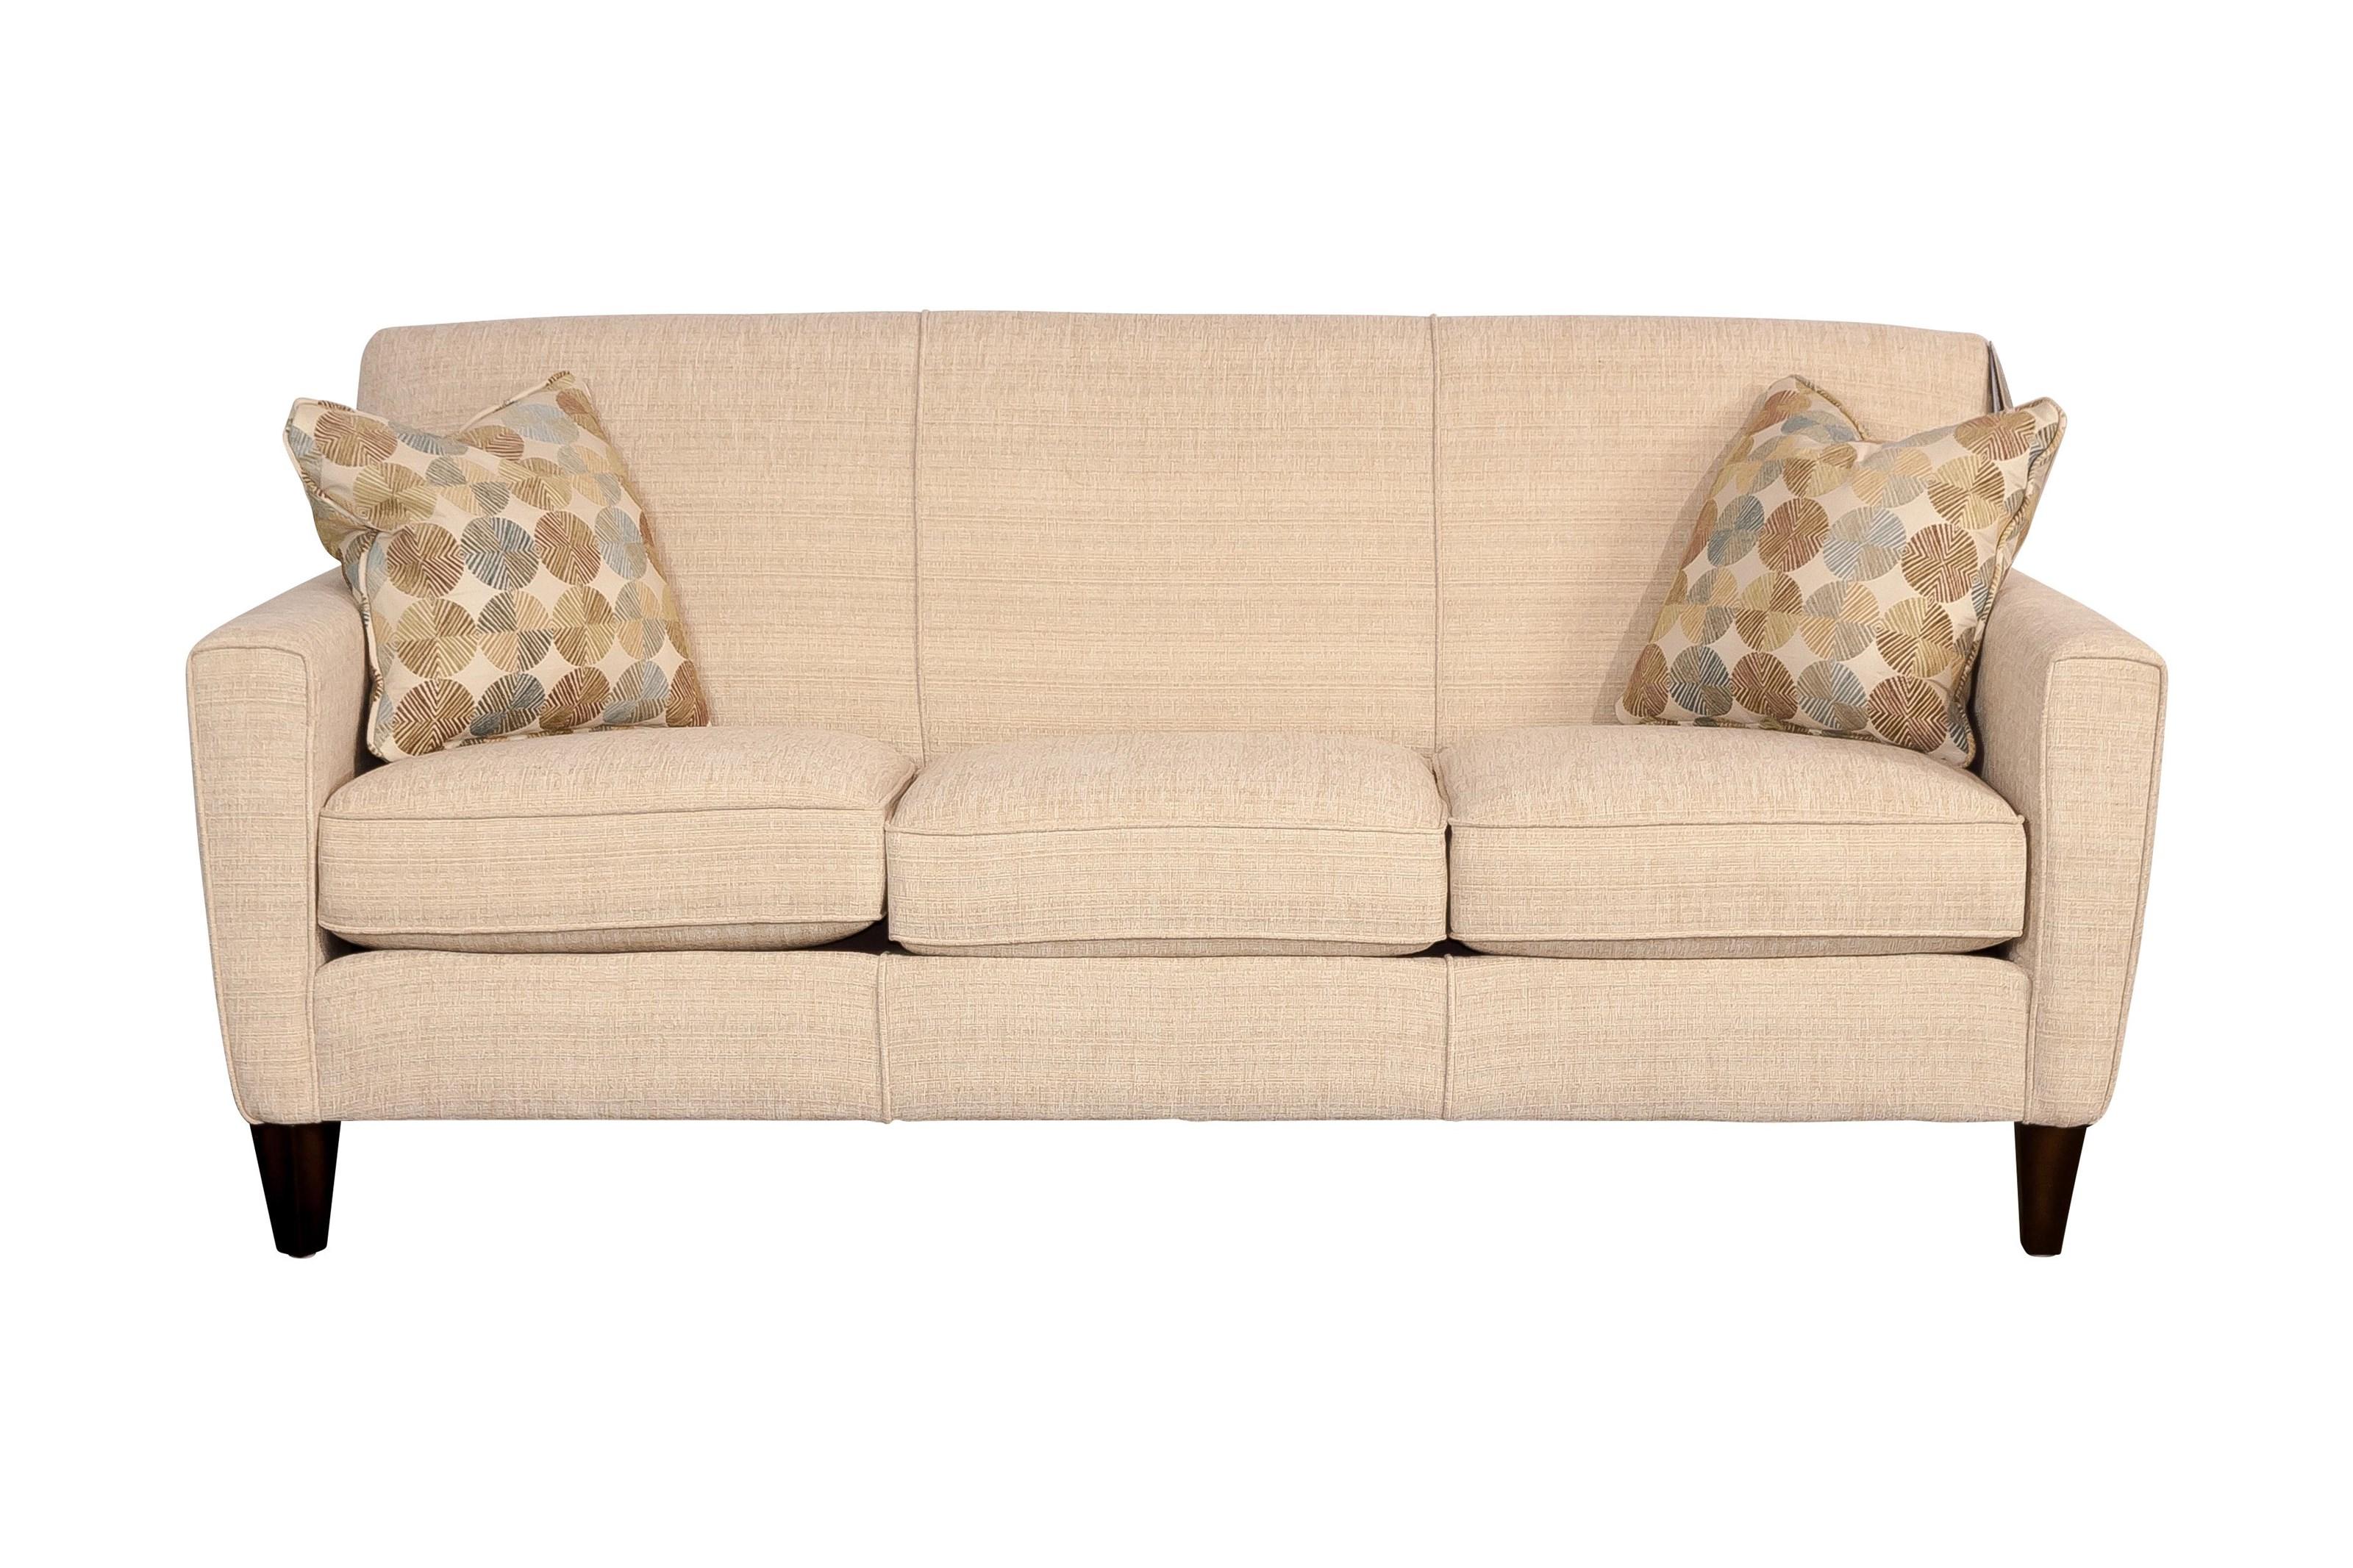 Flexsteel Digby S5966 014 Upholstered